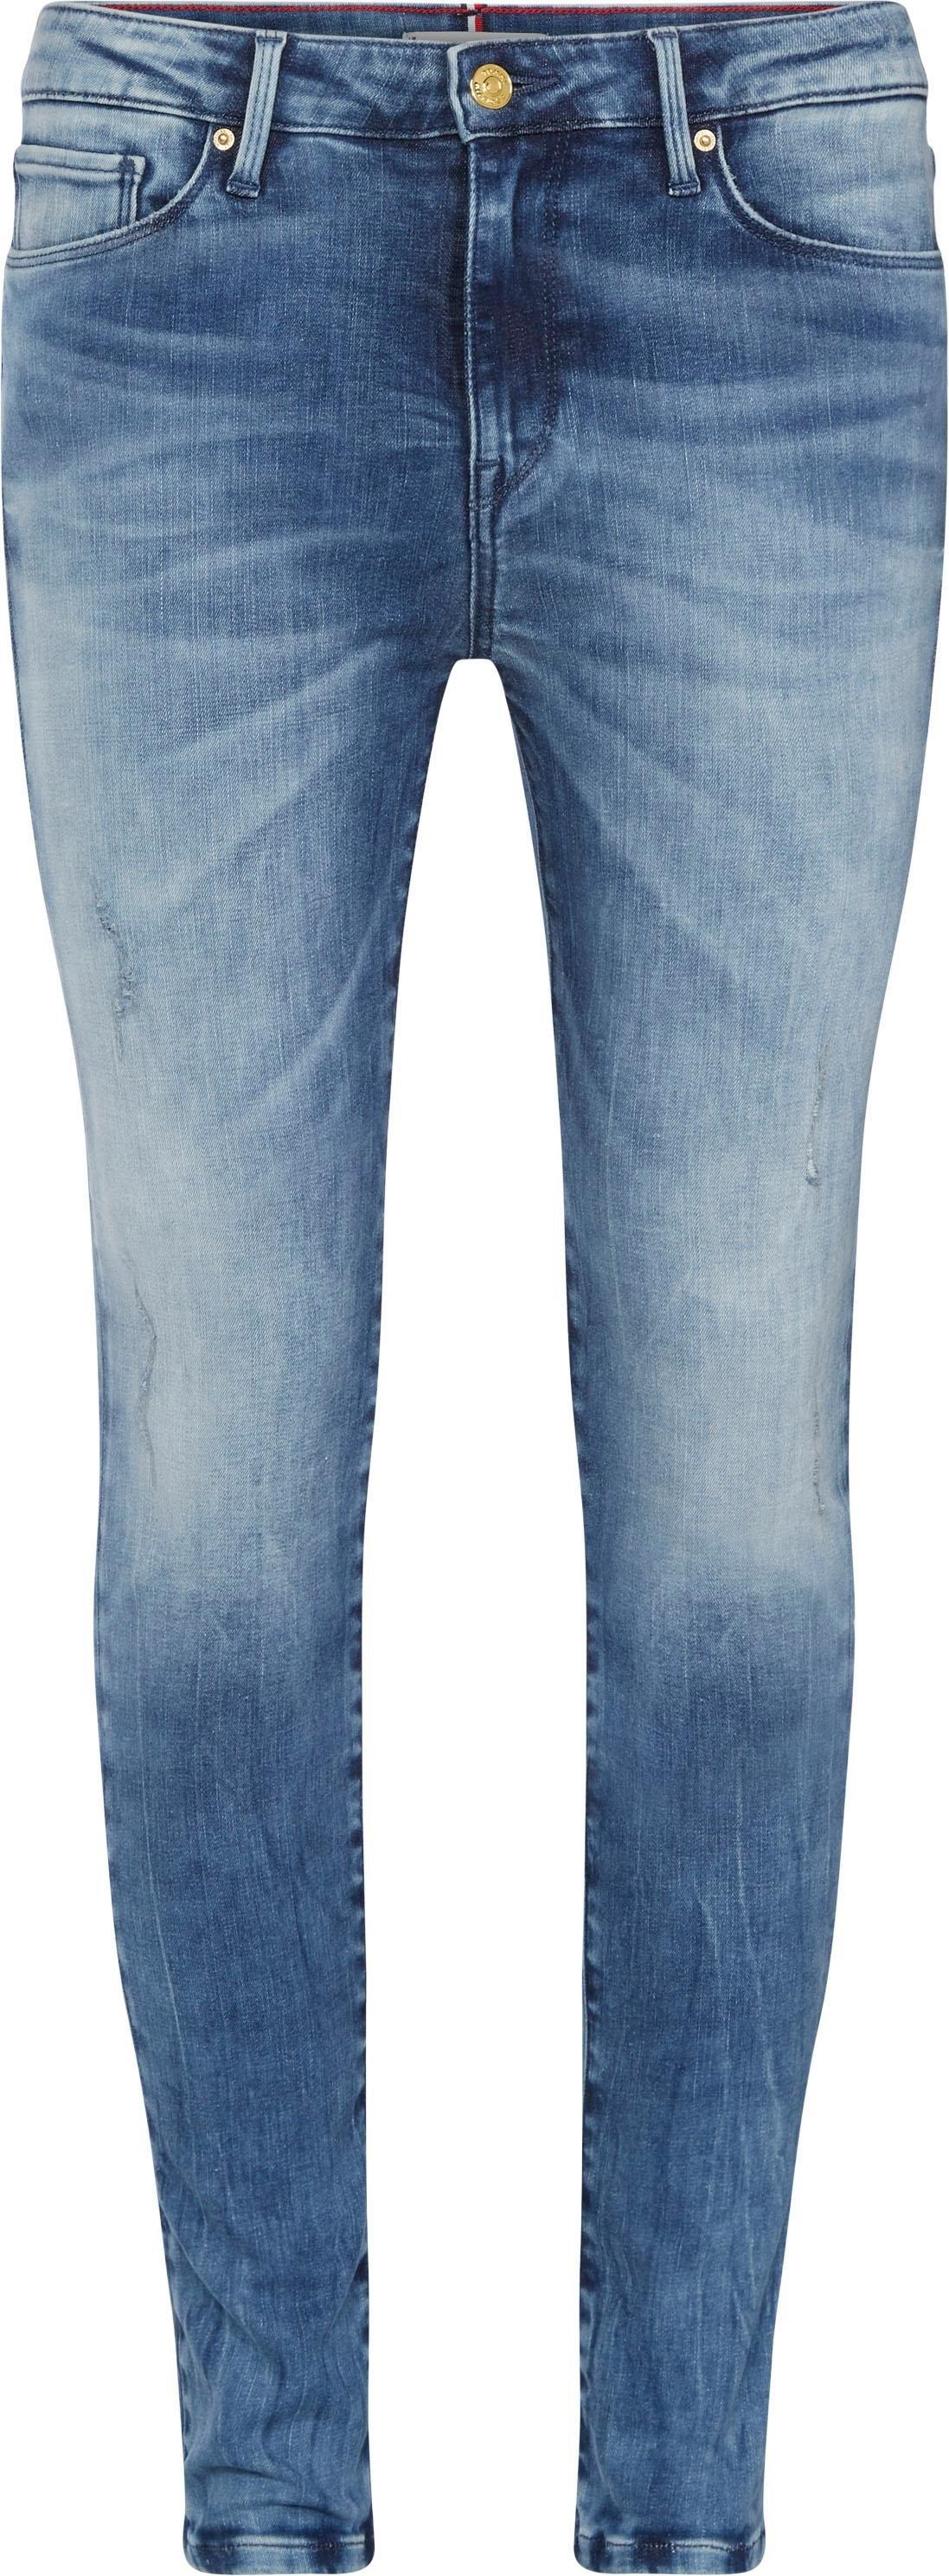 TOMMY HILFIGER skinny fit jeans »HERITAGE COMO SKINNY RW« nu online bestellen